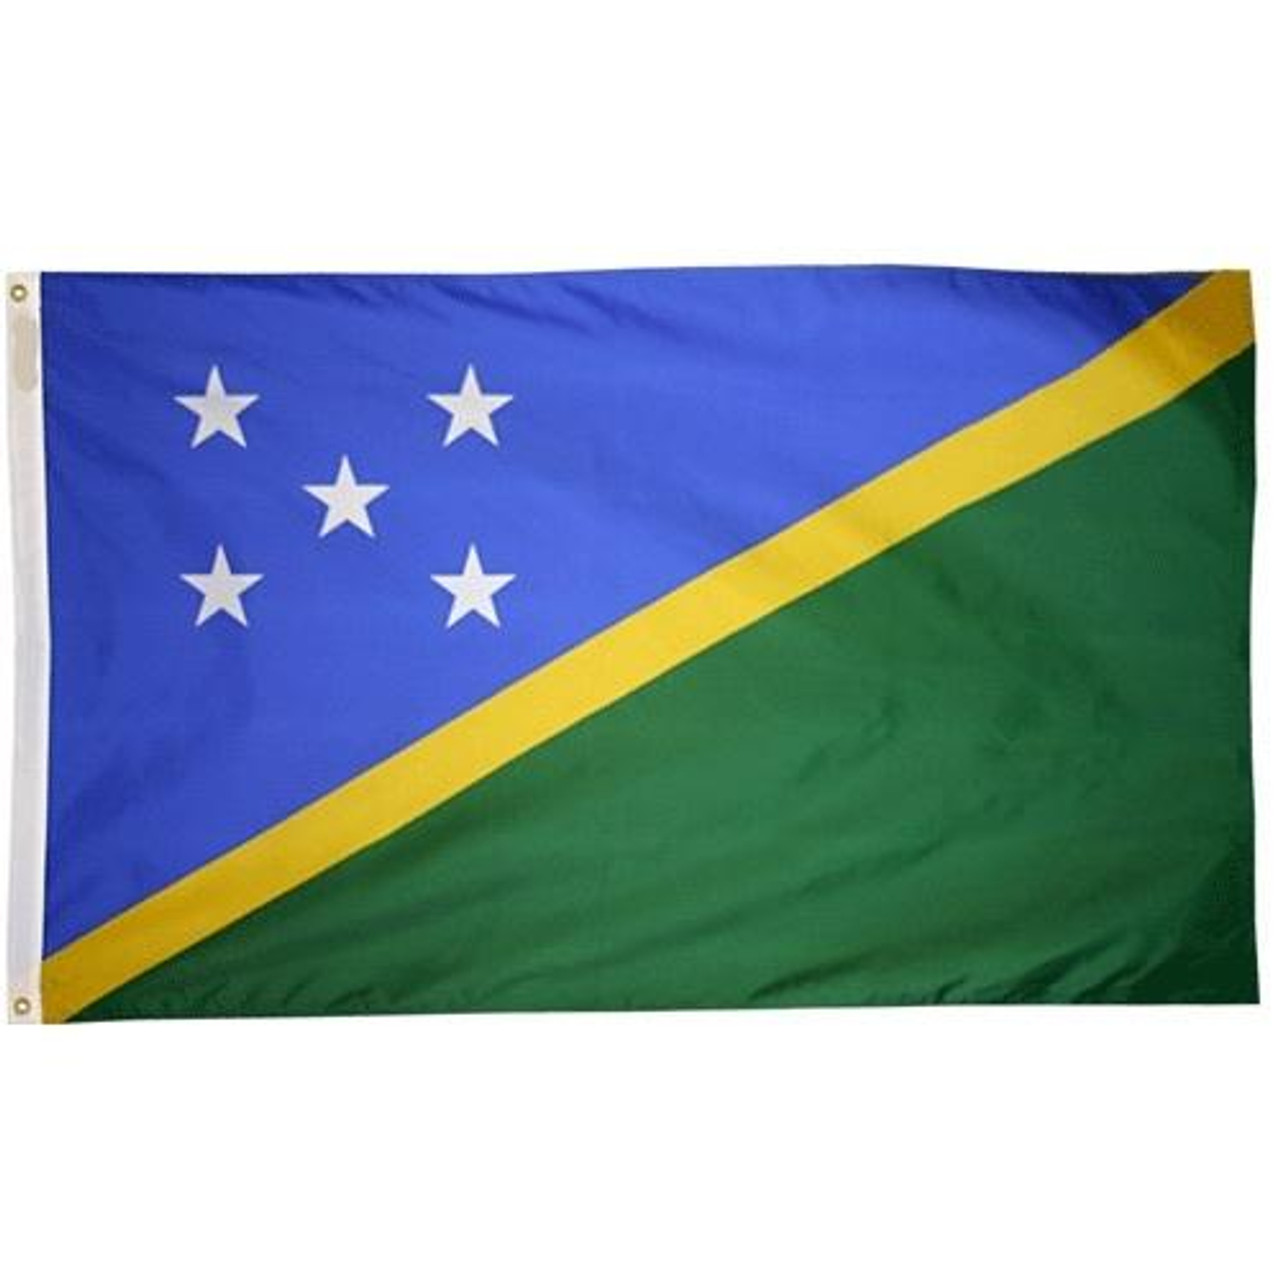 Soloman Islands Flag